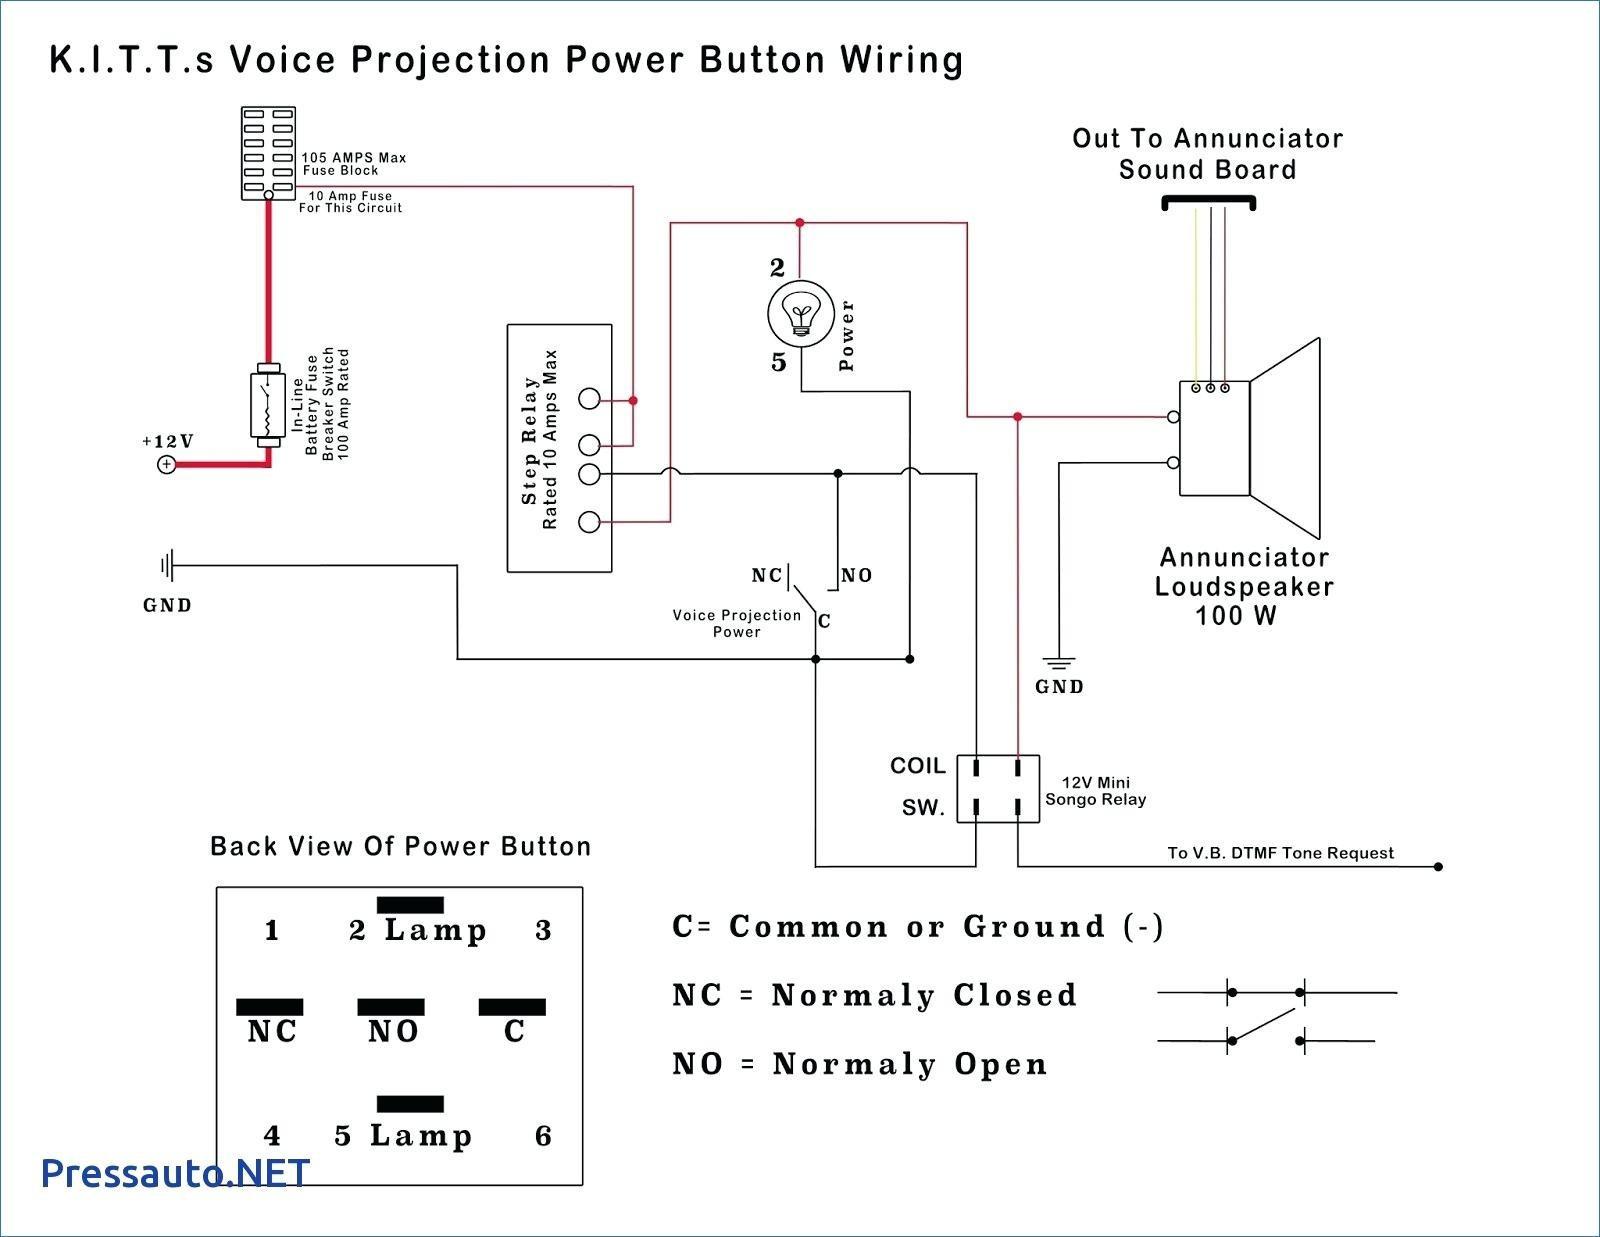 Glow Plug Wiring 6 9 - Wiring Diagram Data Oreo - 7.3 Glow Plug Relay Wiring Diagram